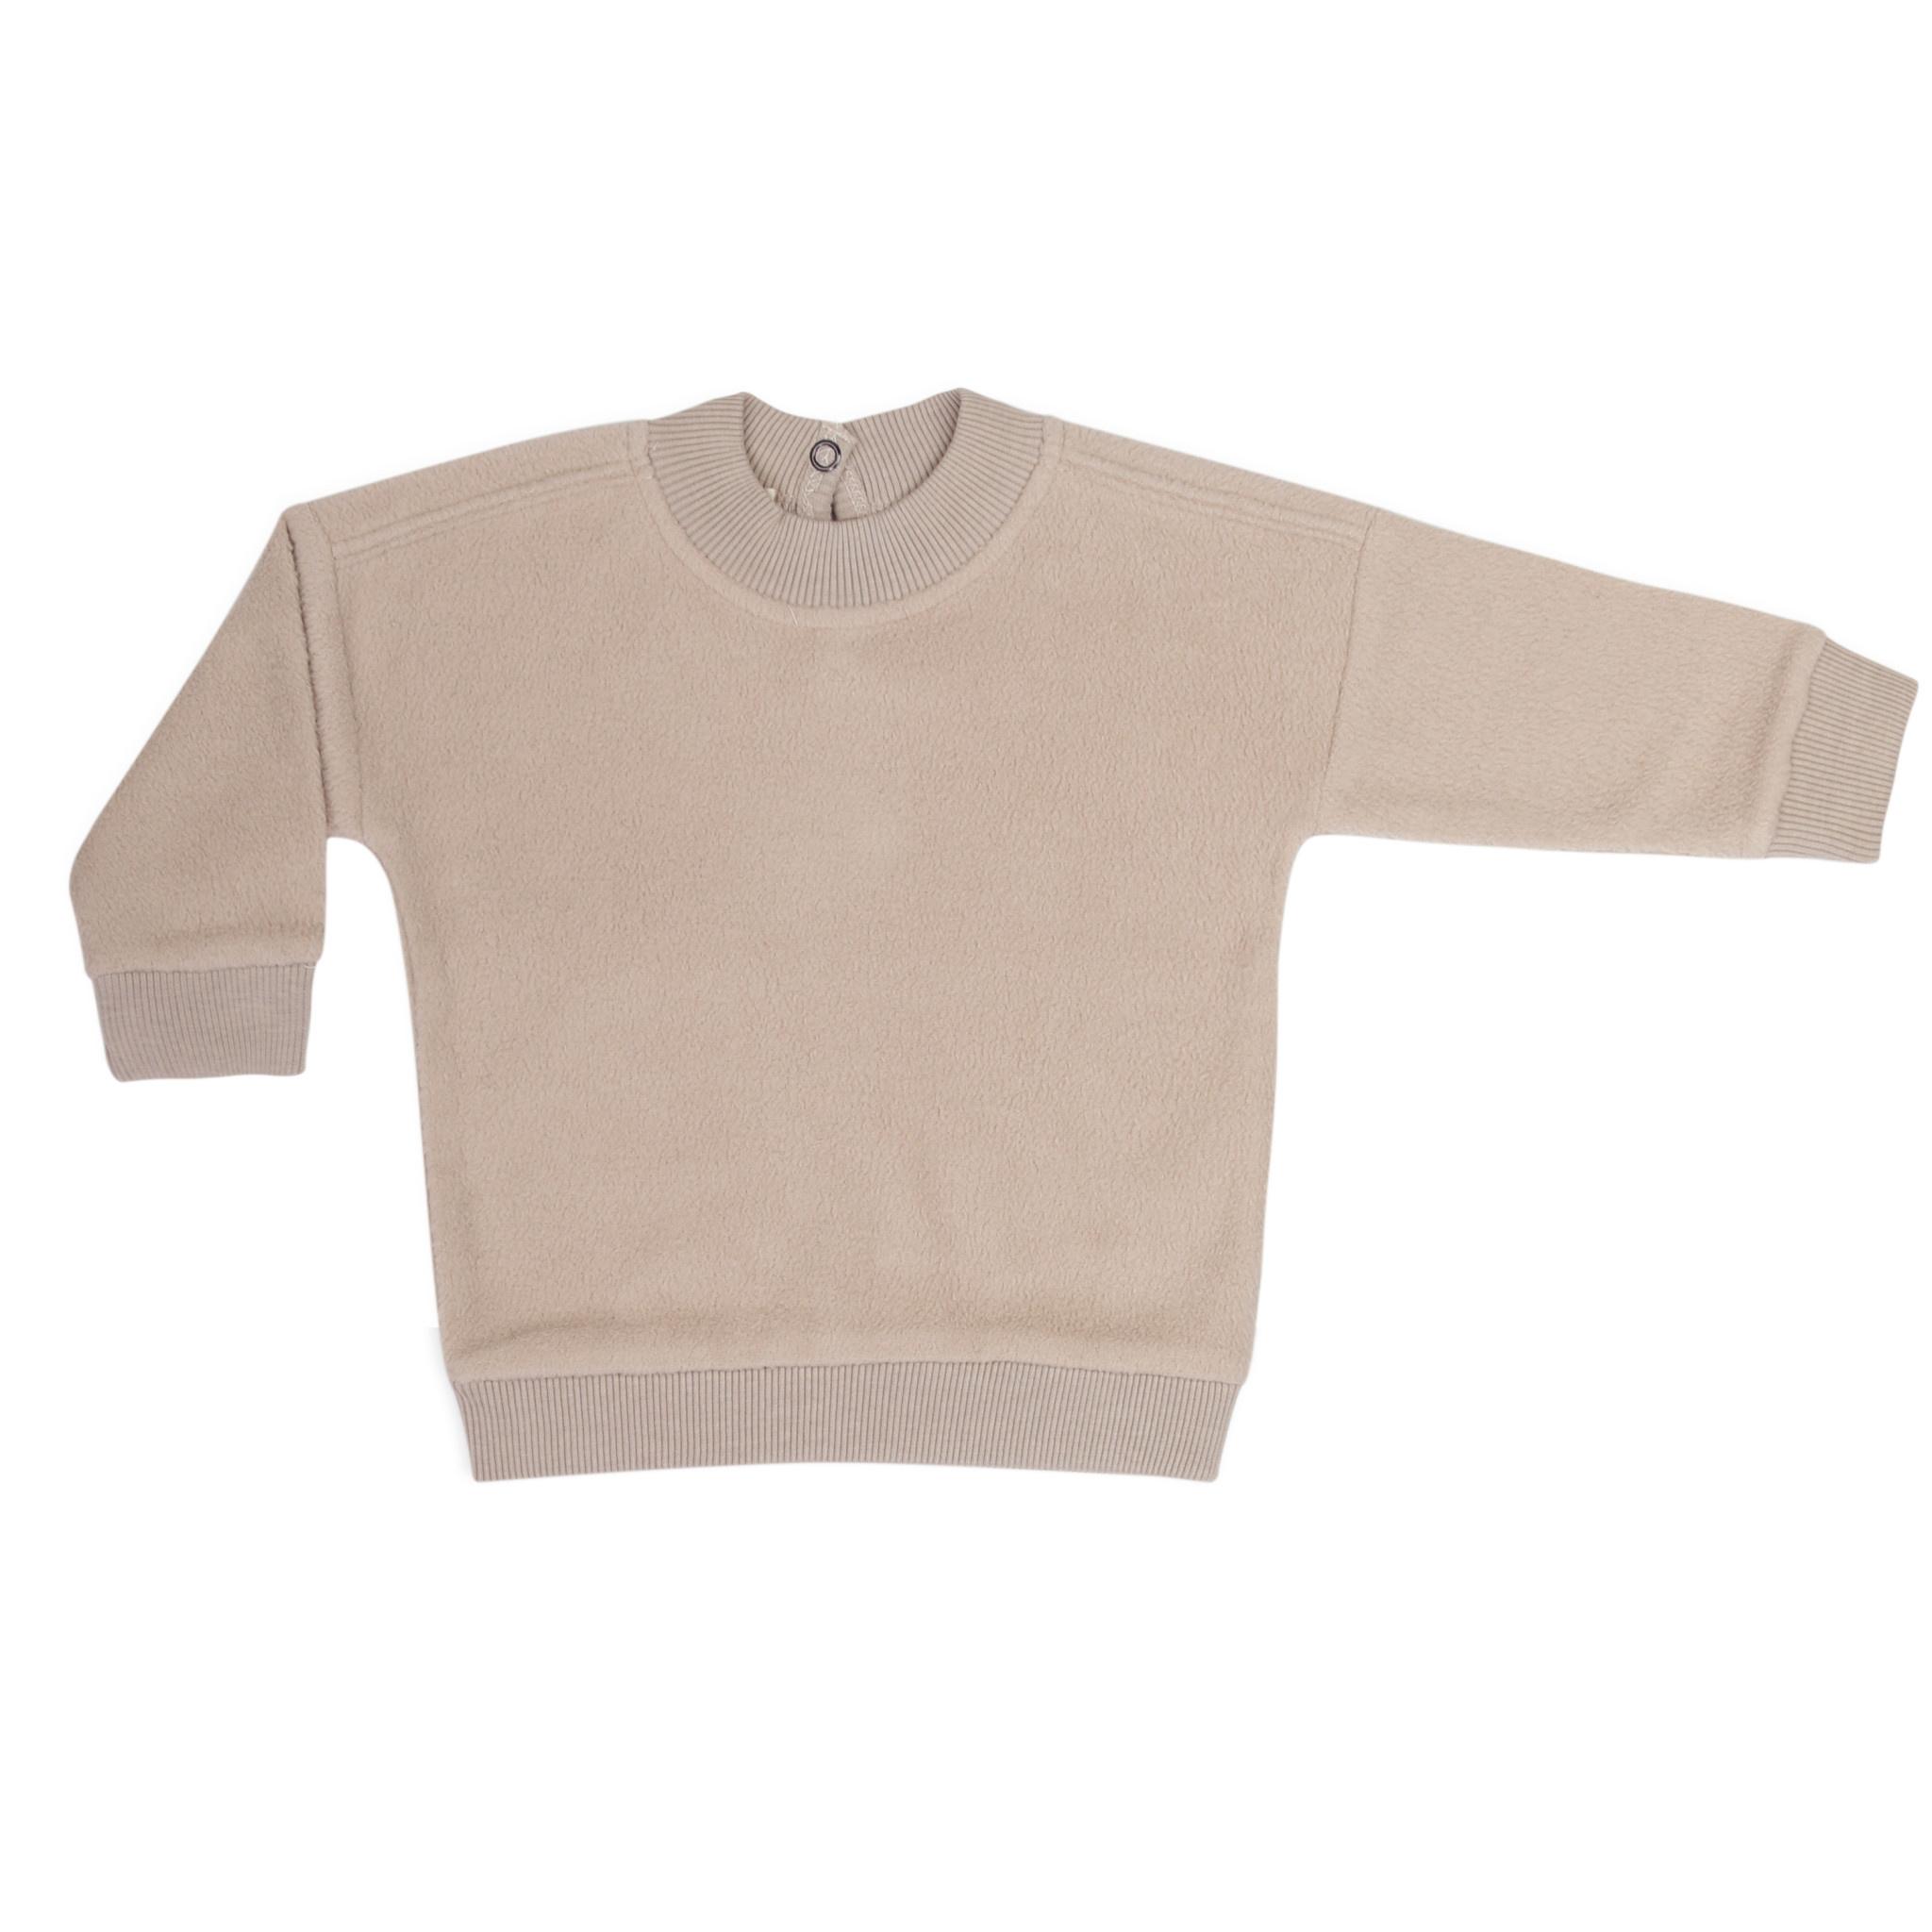 Phil&Phae Phil&phae - Oversized teddy sweater straw